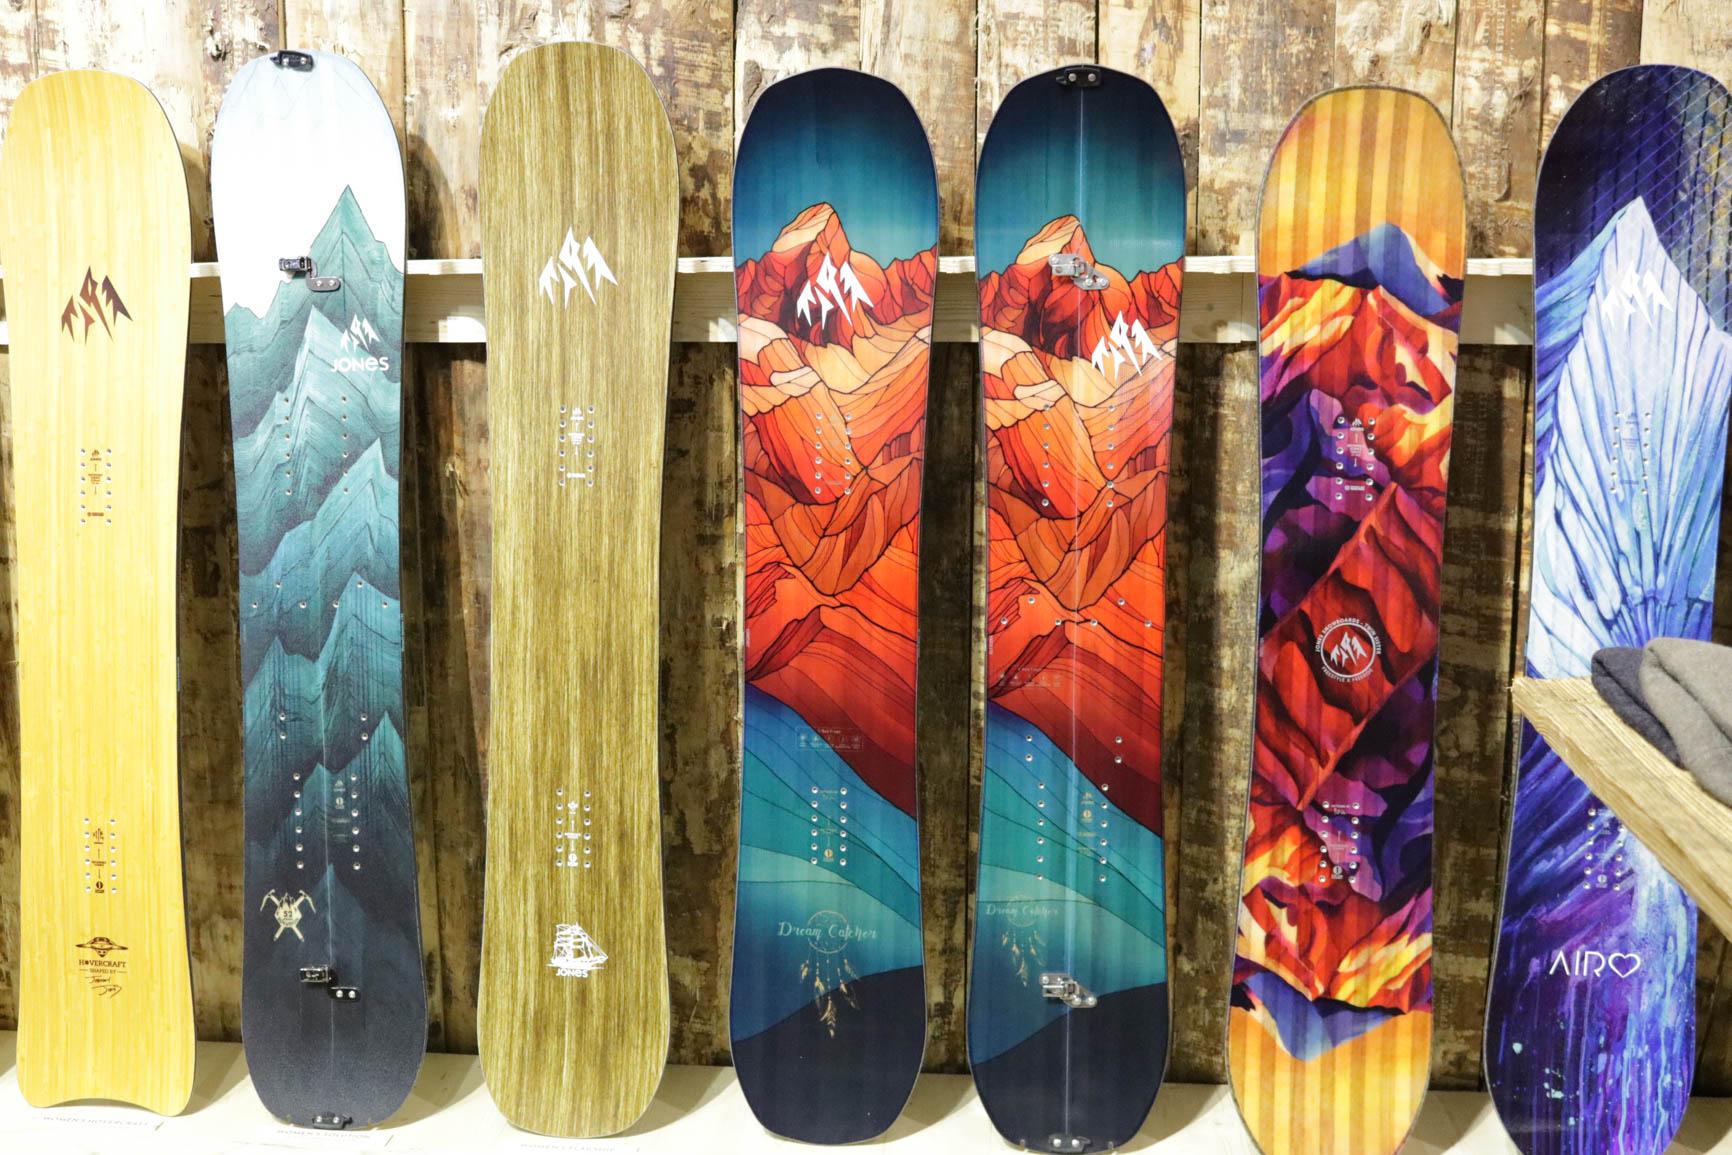 Jones Snowboards 18/19 (von links nach rechts): Hovercraft, Women's Solution, Flagship, Dream Catcher, Dream Catcher Split, Twin Sister, Airheart